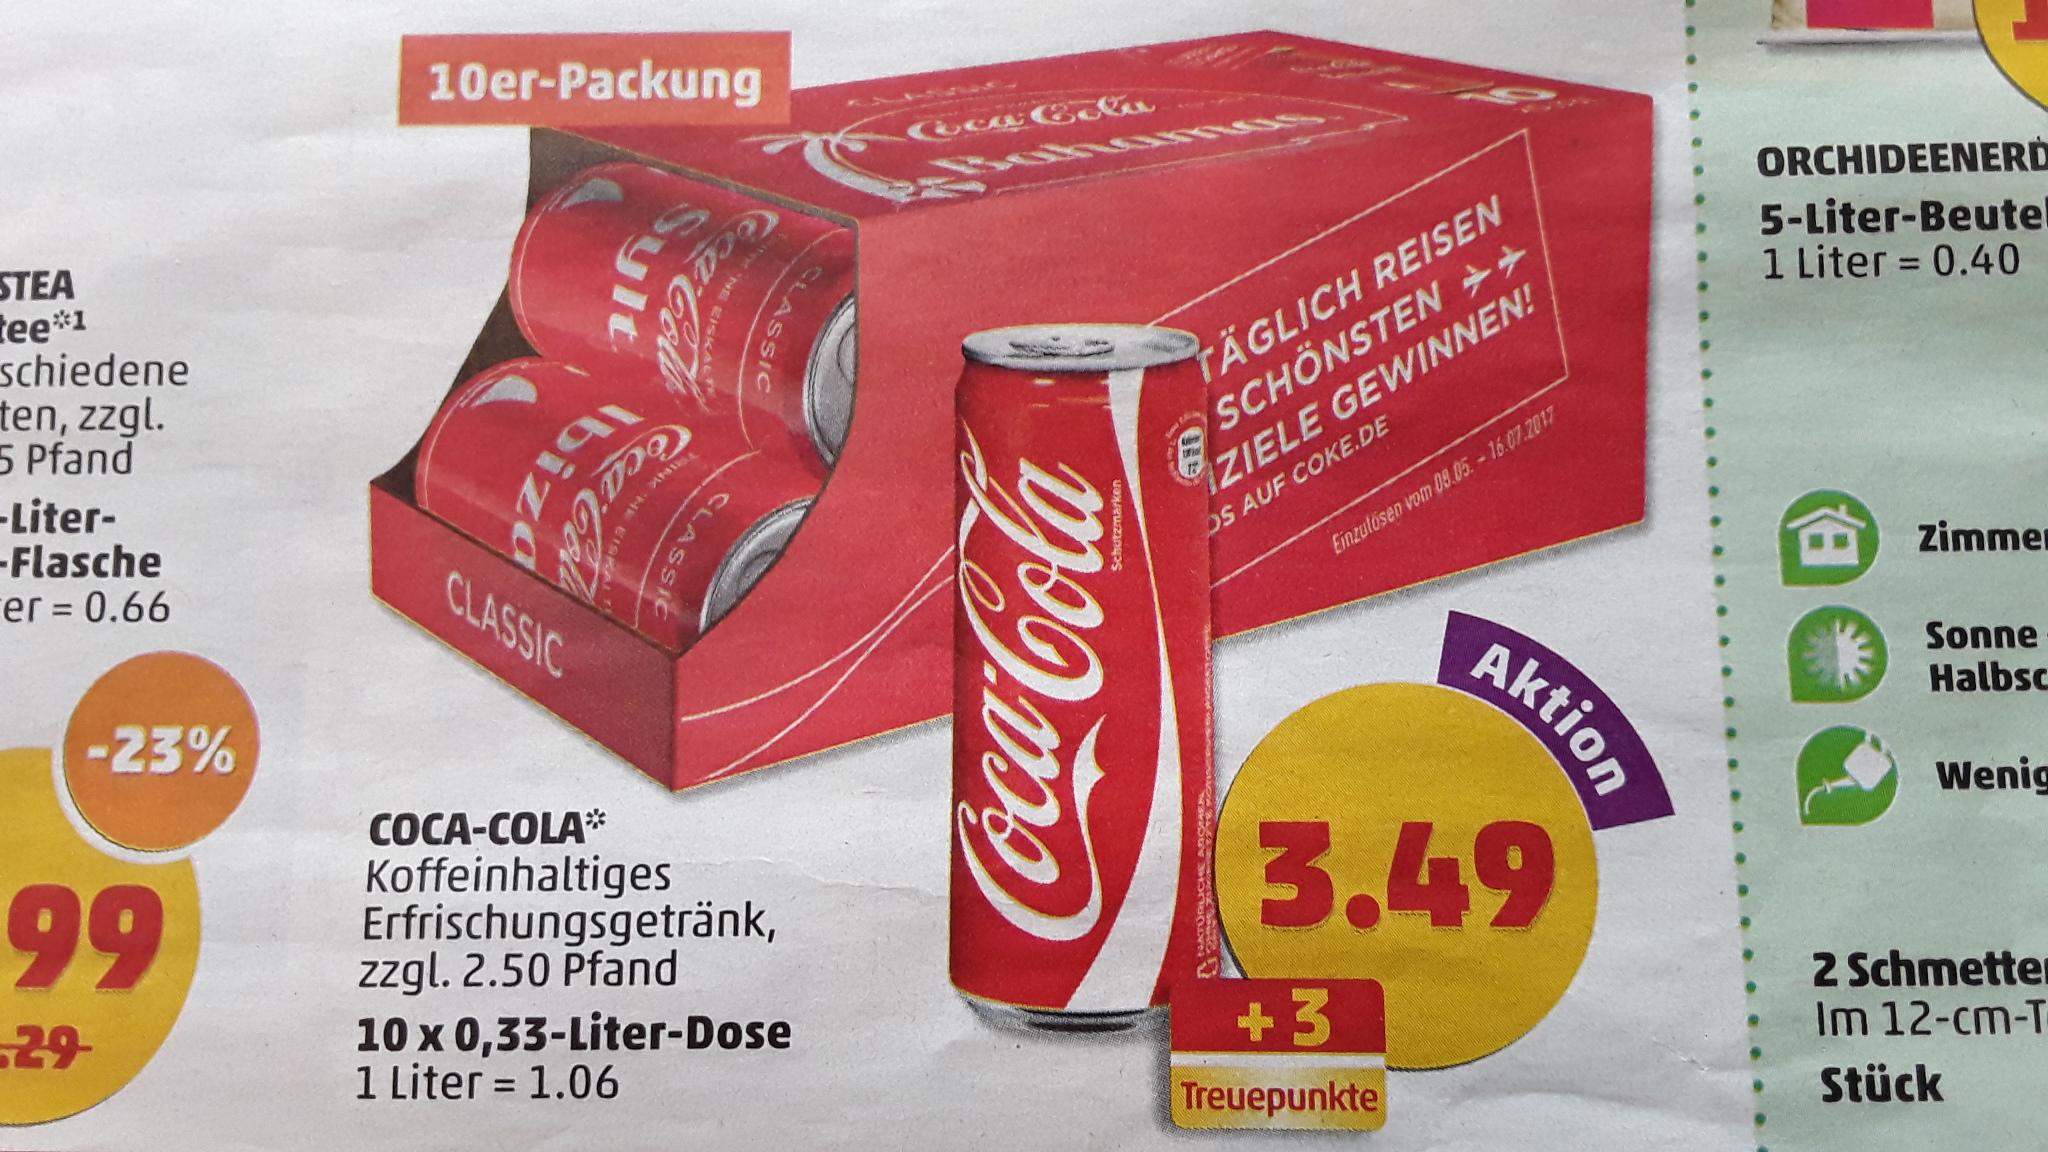 Coca Cola 10x 0,33l Friendspack ab 3.7.17 für 3,49 € / Norma ab 7.7 für 3,33 € ( jeweils zzgl. 2,50 € Pfand @ Penny / Lidl/ Norma